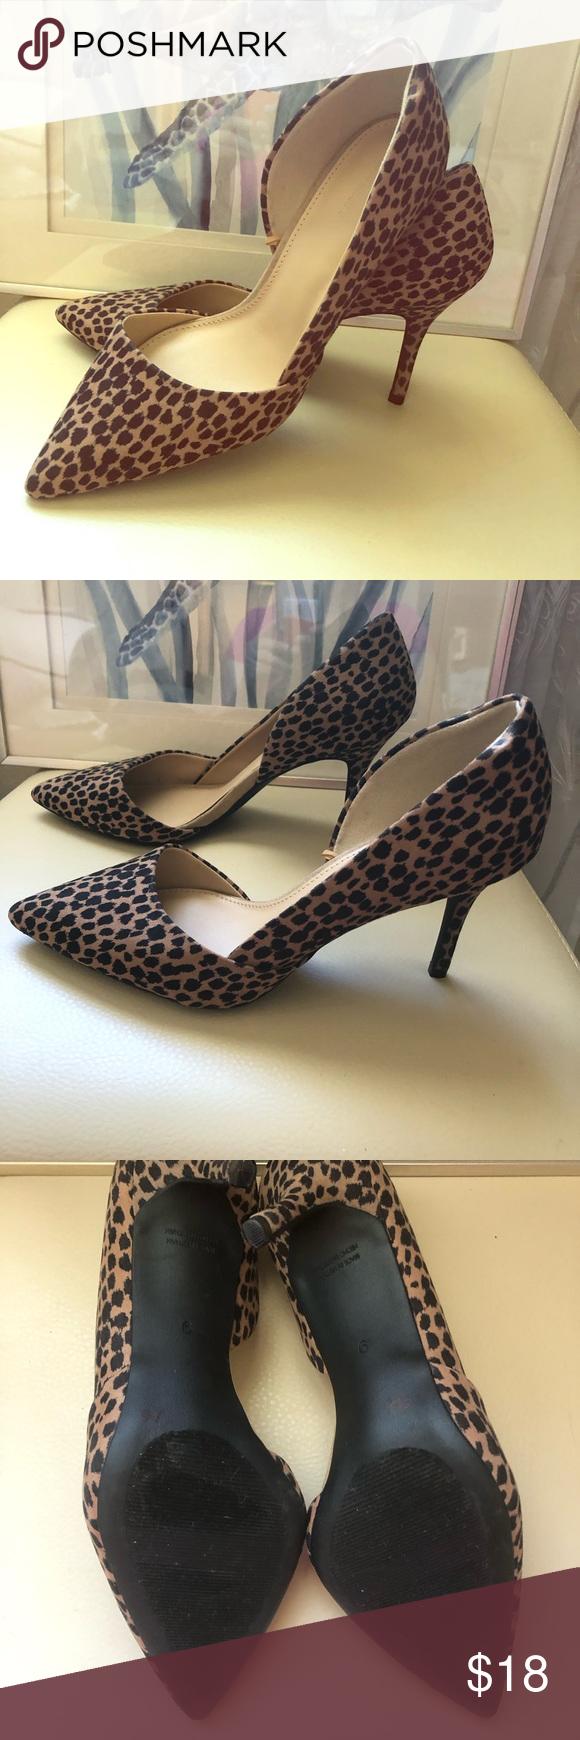 🎁🎁OLD NAVY LEOPARD PUMPS | Leopard